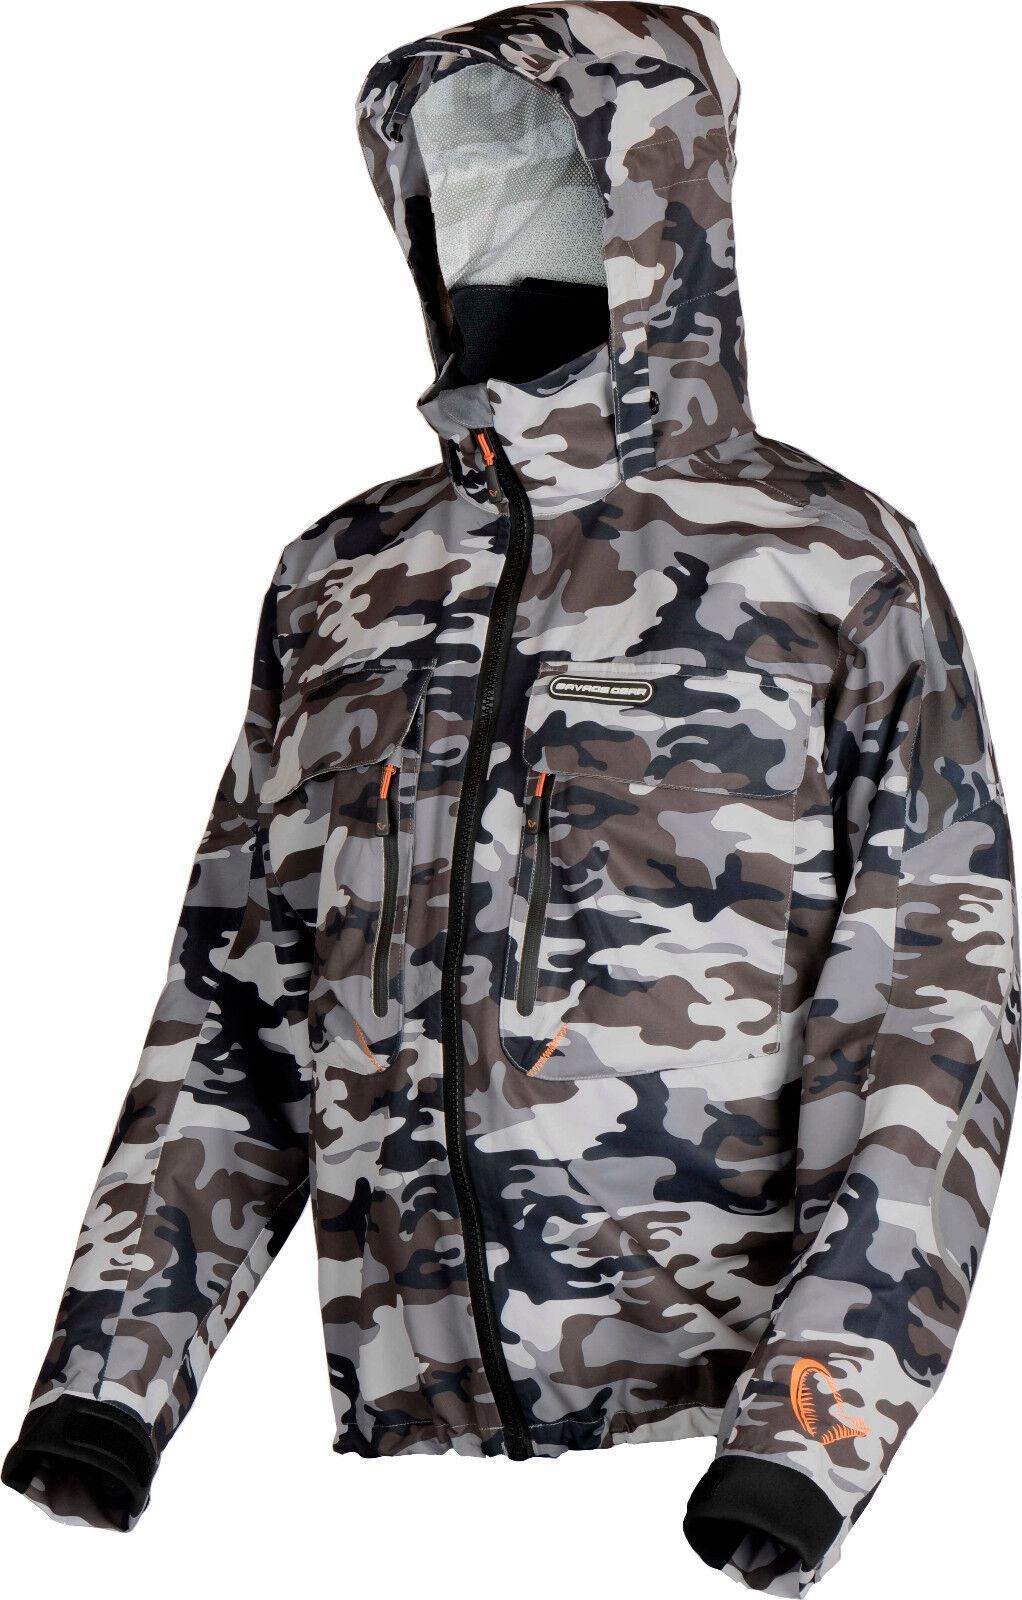 Savage Gear camo Jacket S-XXL 100% viento - & estancos chaqueta watjacke bota chaqueta